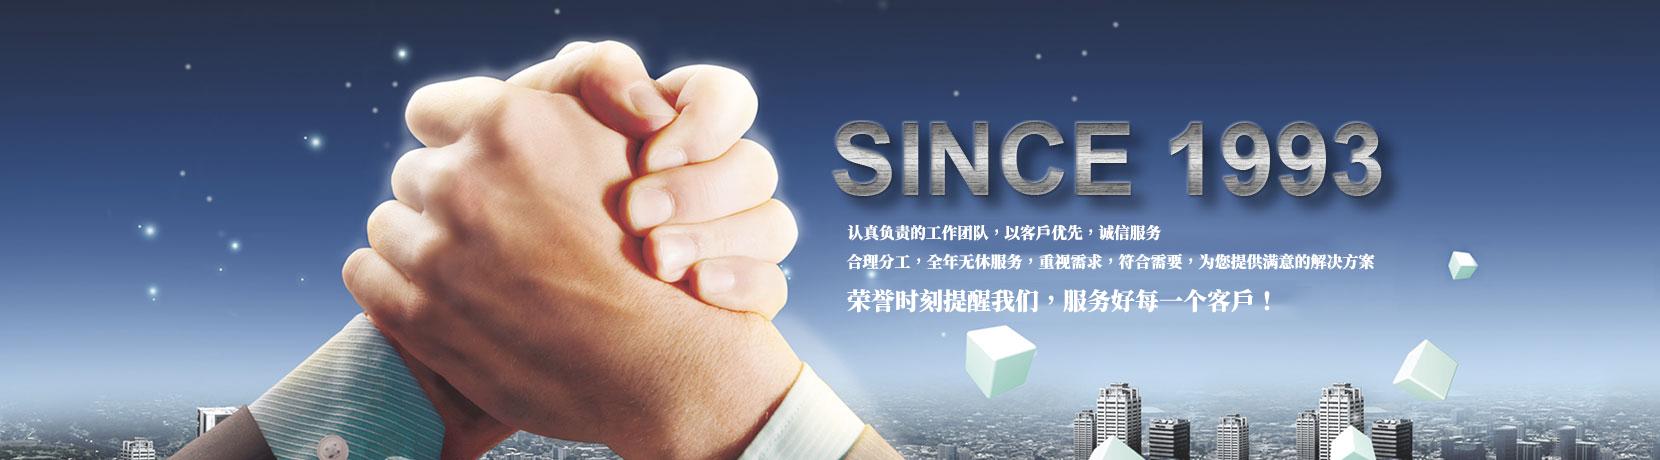 智茂全自动PCB分板机厂家网站极速快三banner5